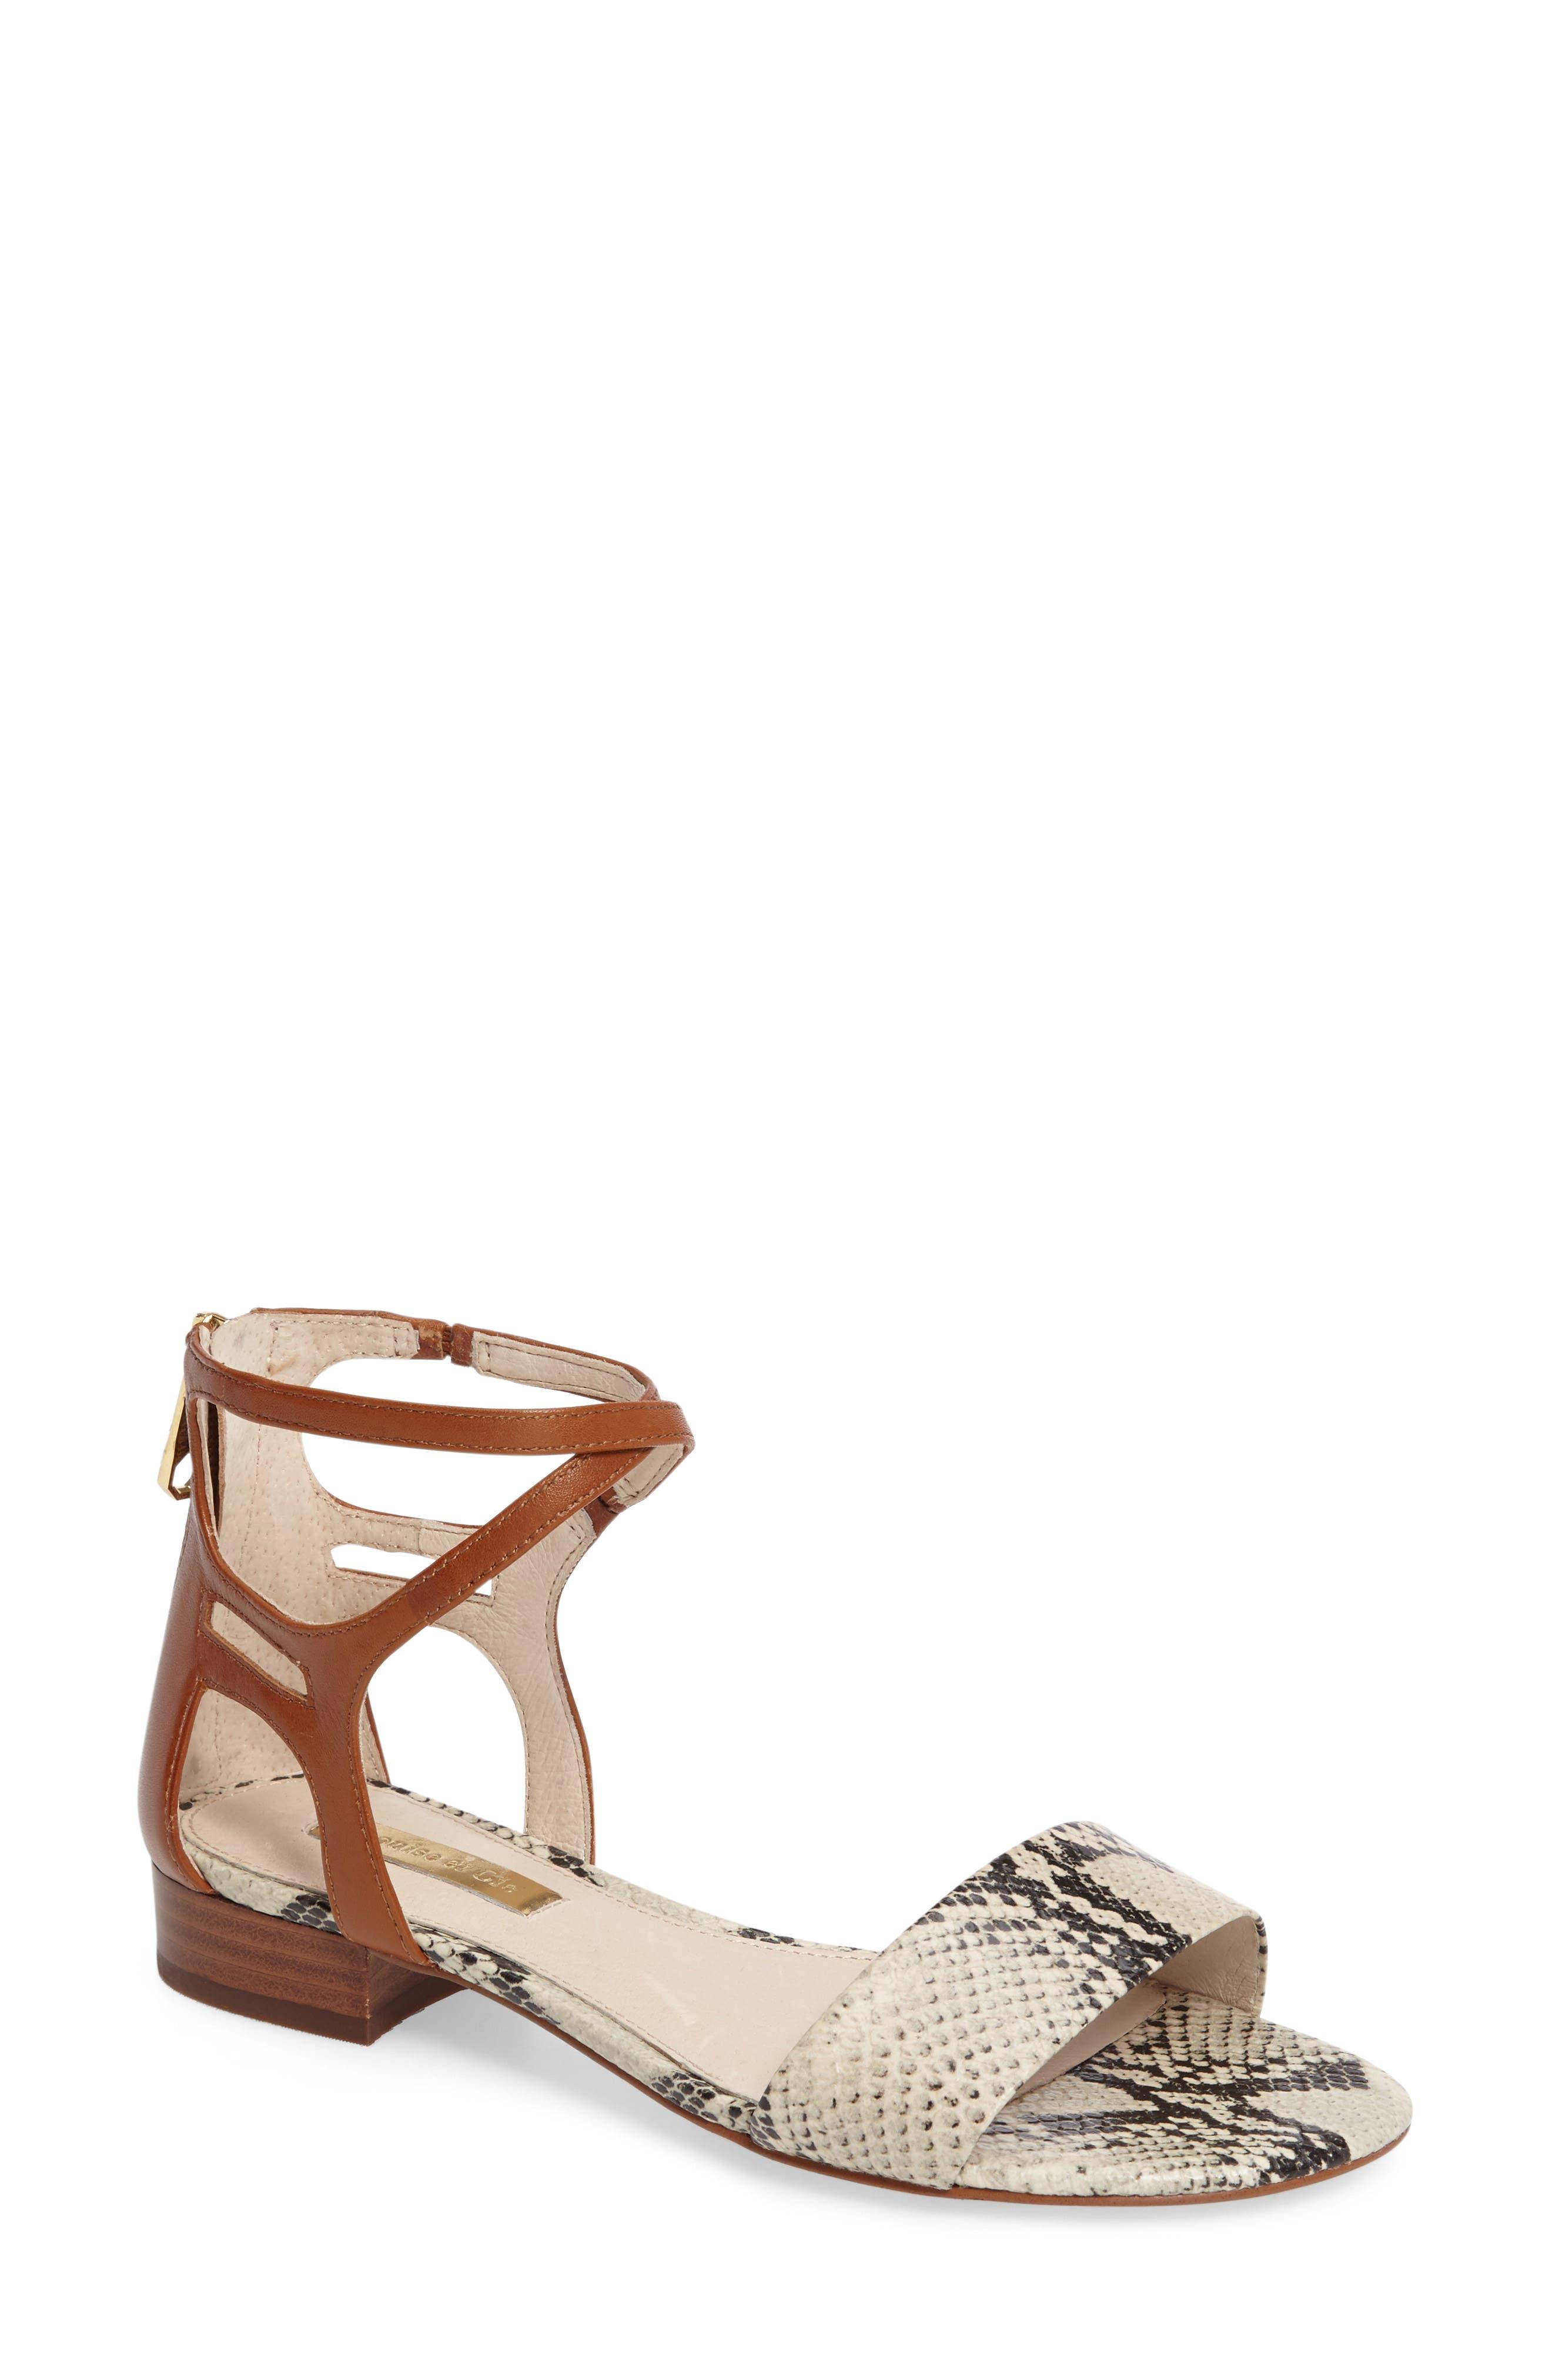 Alternate Image 1 Selected - Louise et Cie Adley Ankle Strap Sandal (Women)